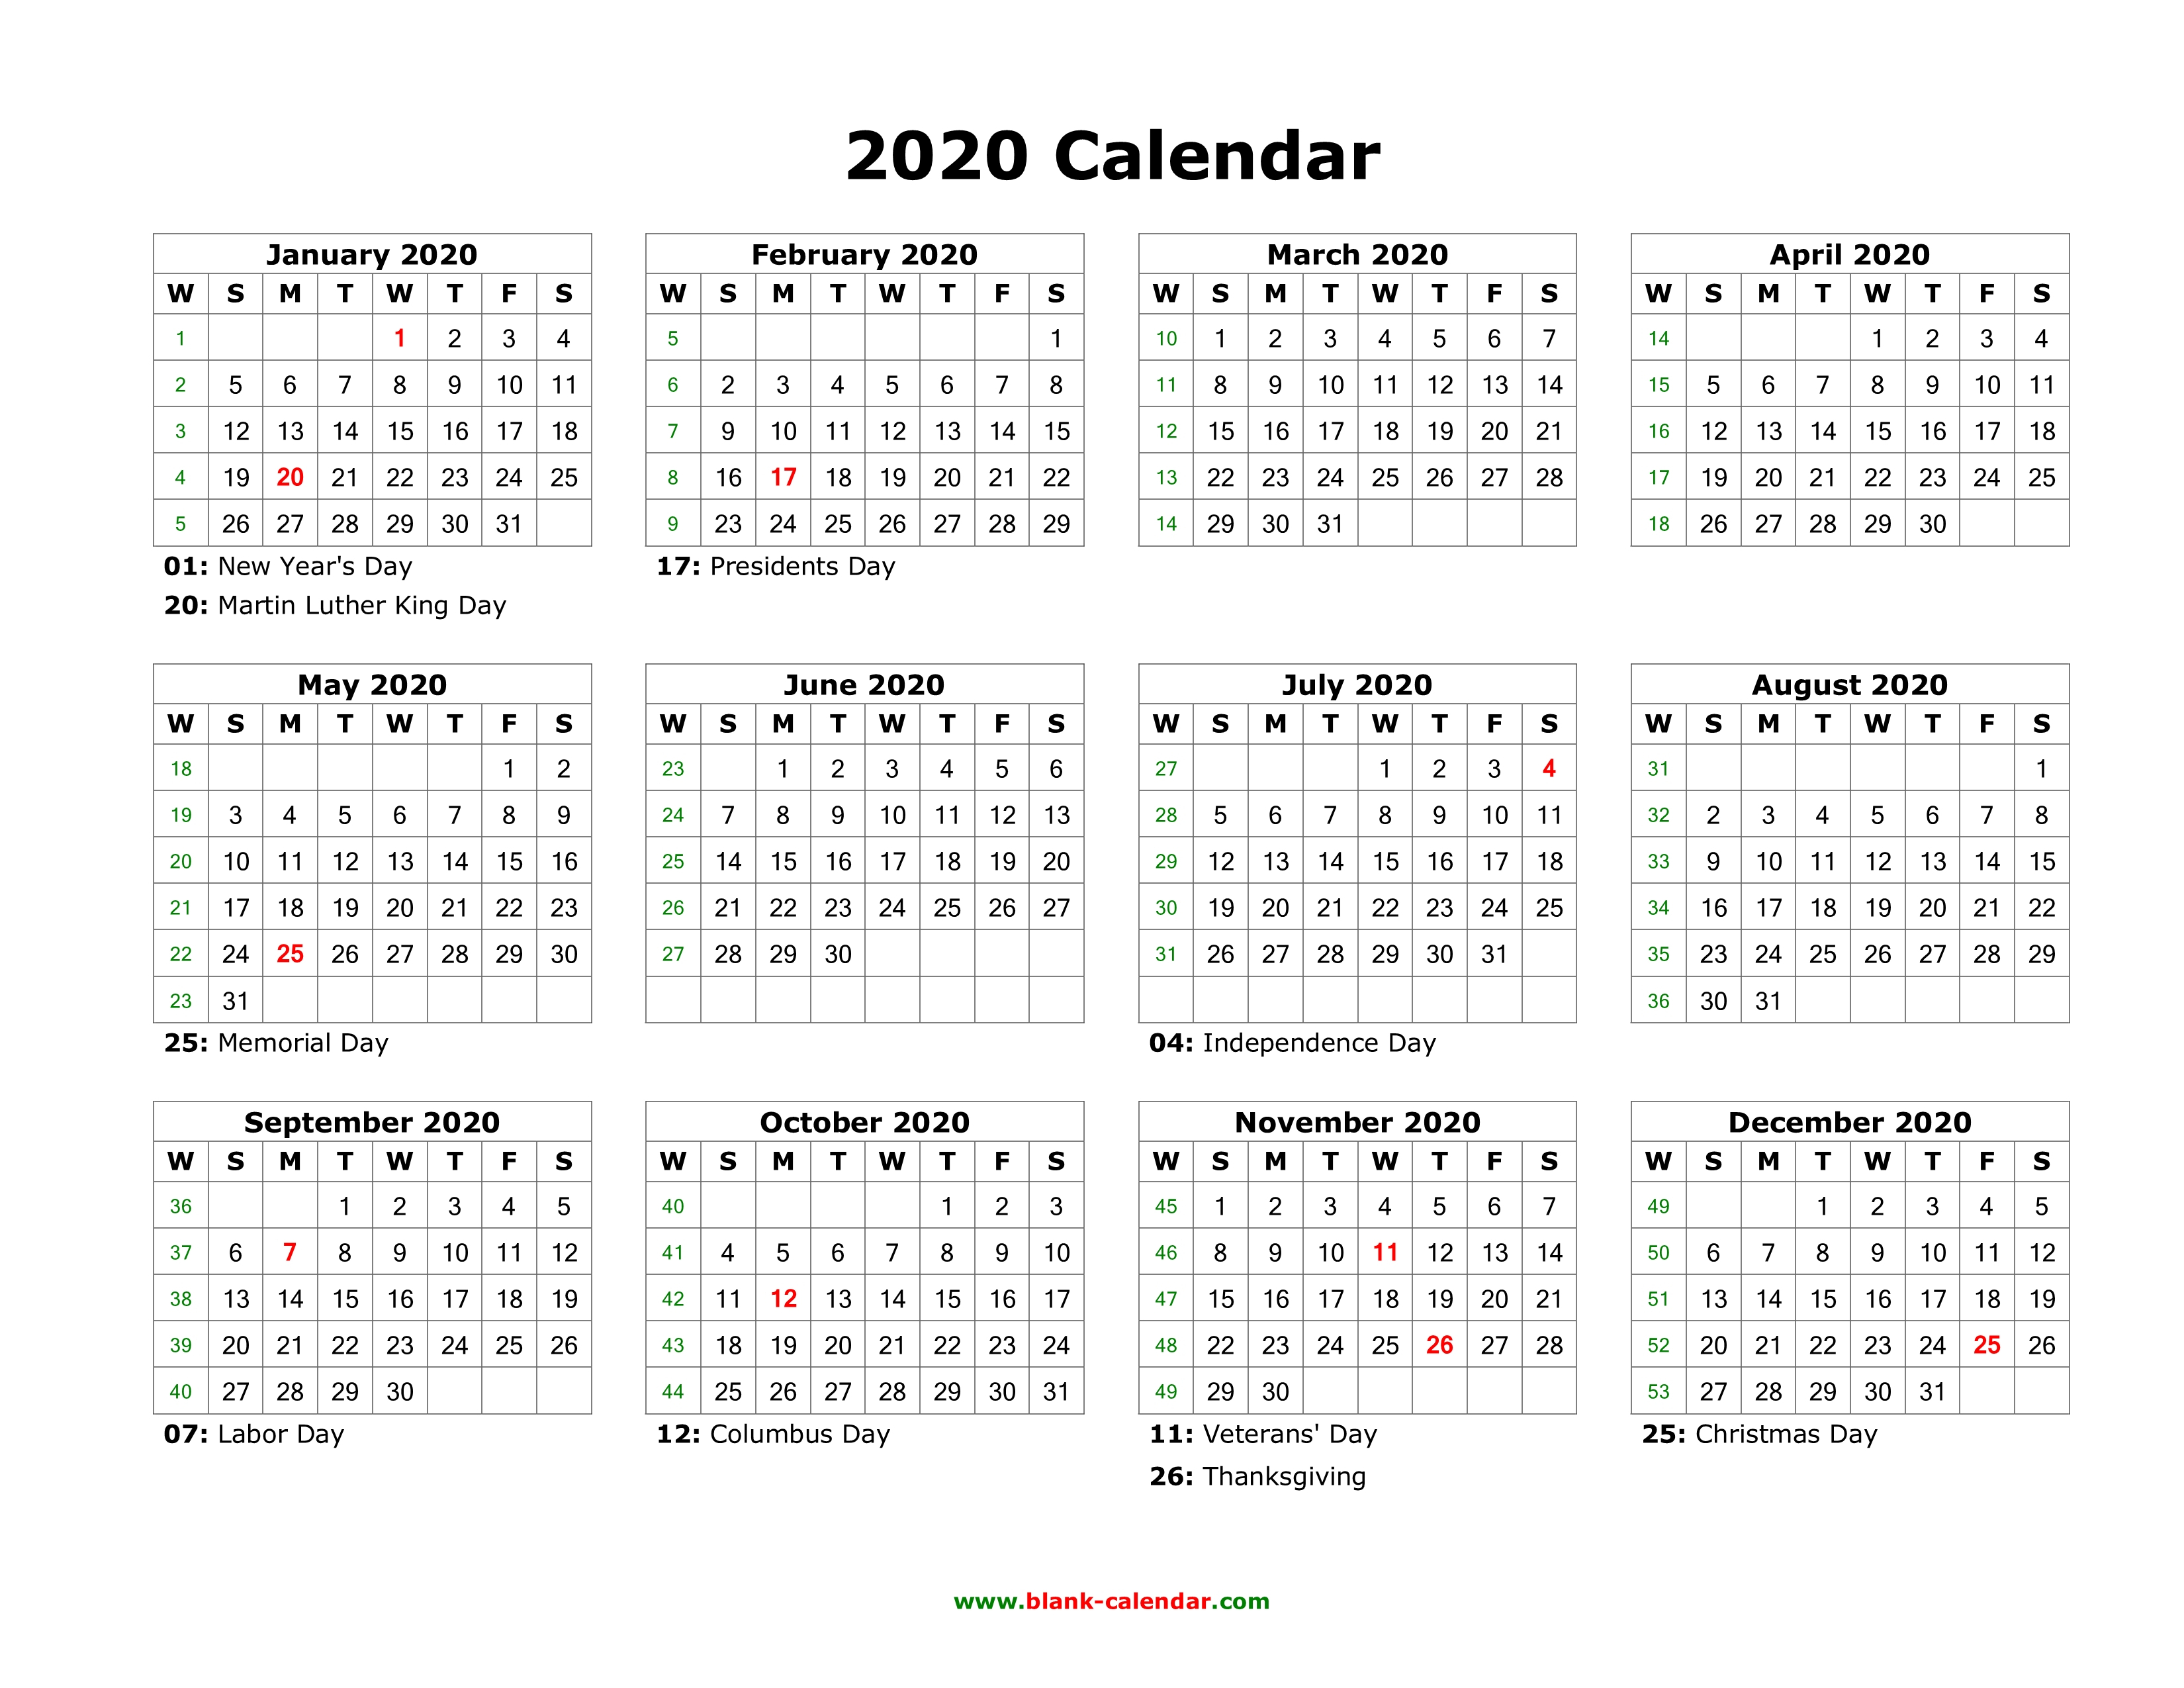 Blank Calendar 2020 | Free Download Calendar Templates in 2020 Printable Calendar Templates Quarterly